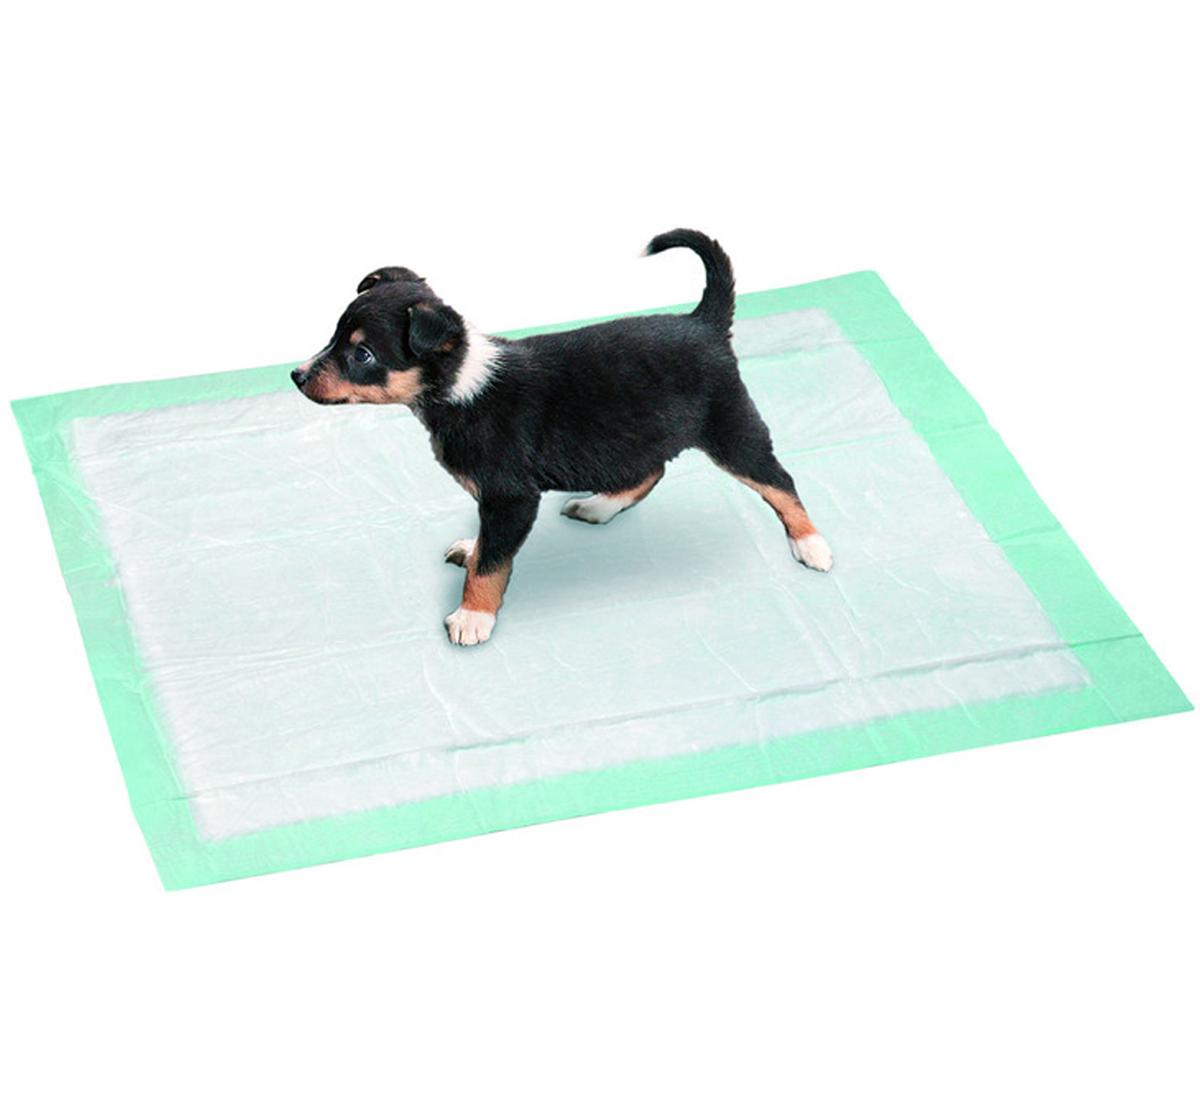 puppy potty training pads 48x40 cm 6 pcs karlie training